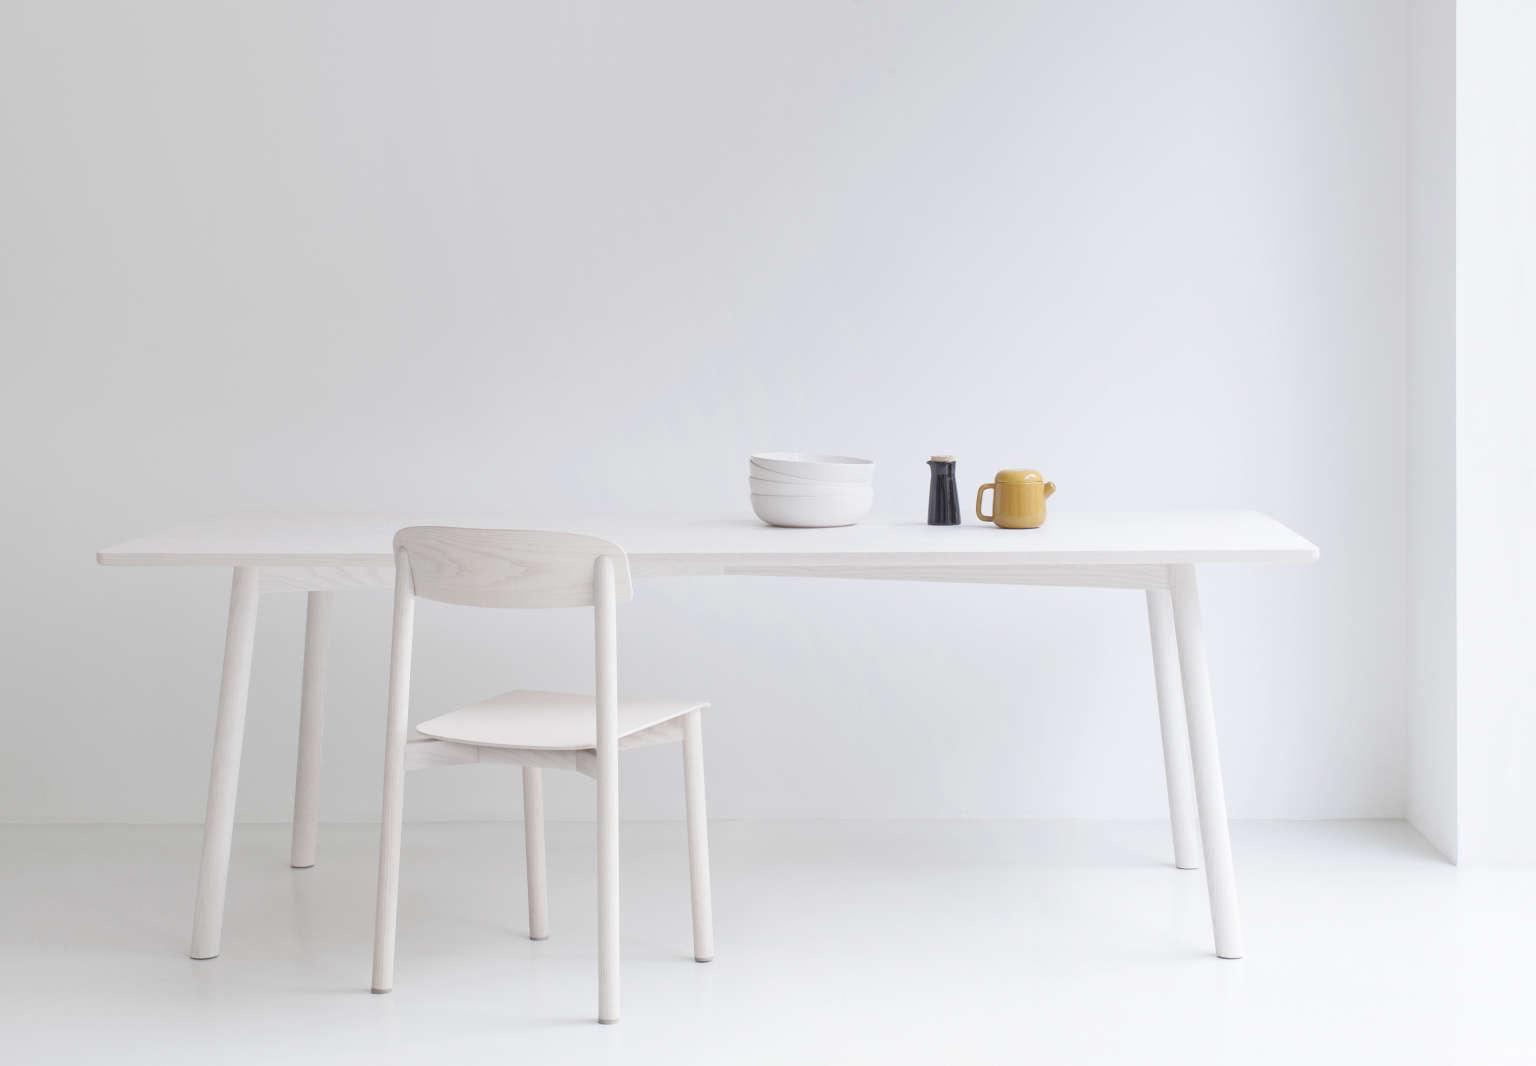 minimalist wooden furniture by stattmann neue moeble. Black Bedroom Furniture Sets. Home Design Ideas